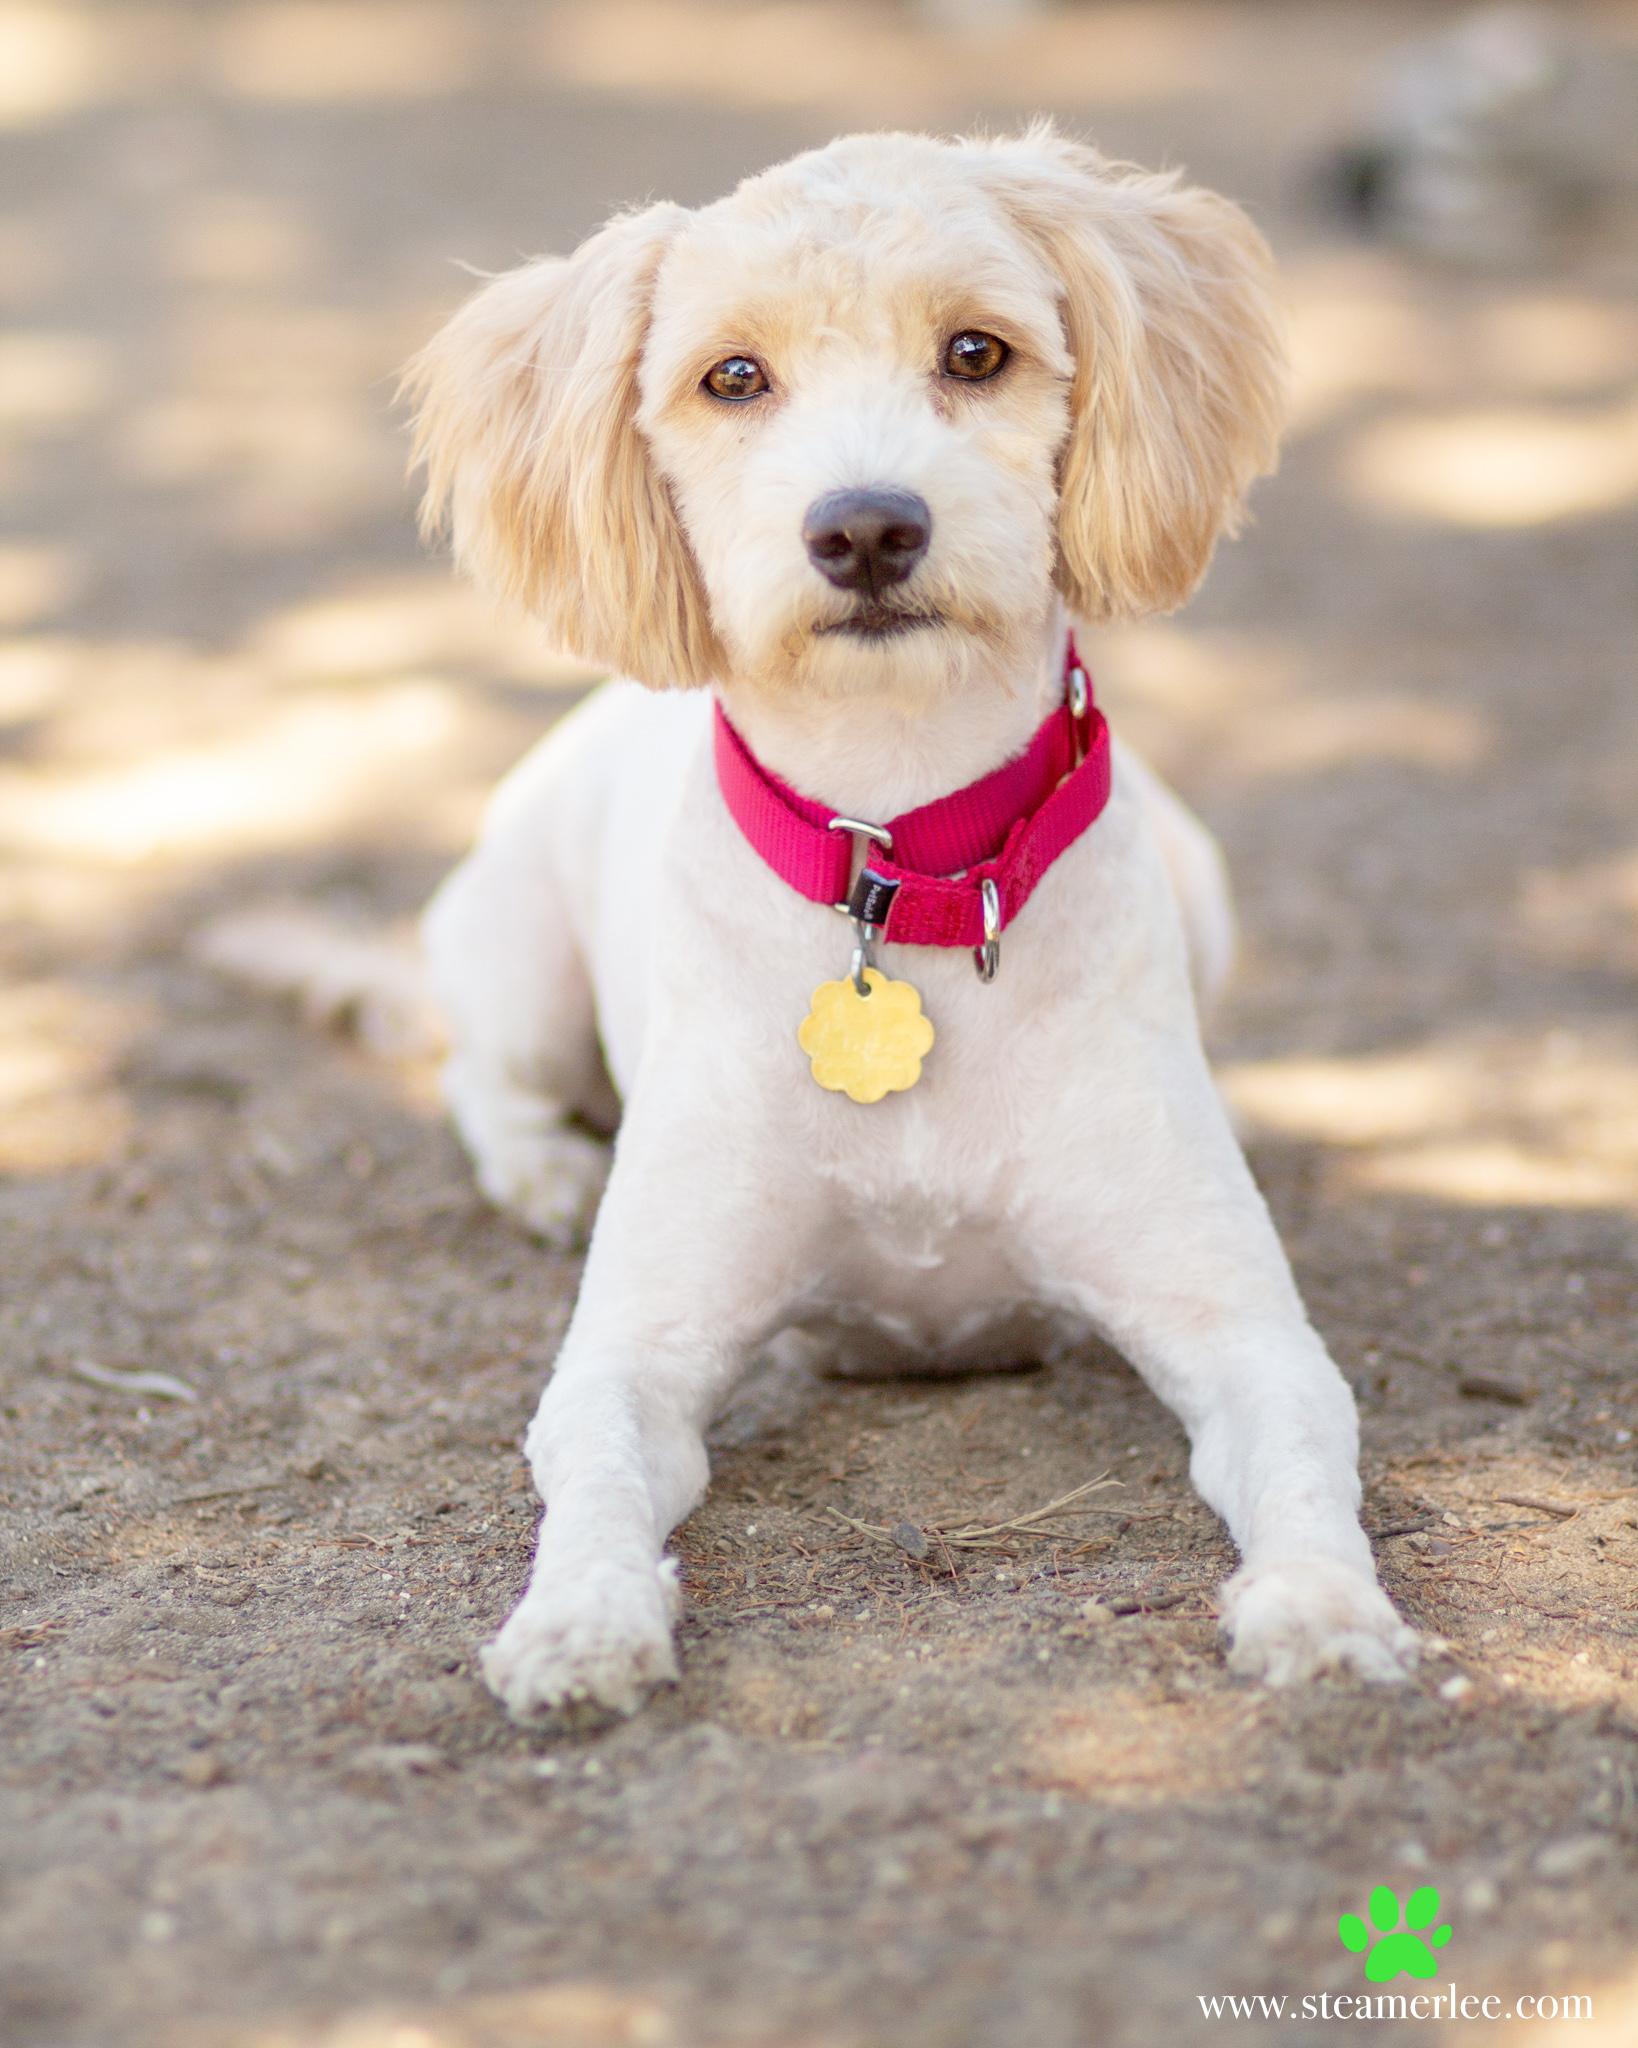 469-Orange-County-Dog-Photography-Steamer-Lee-Southern-California-SBACC.JPG